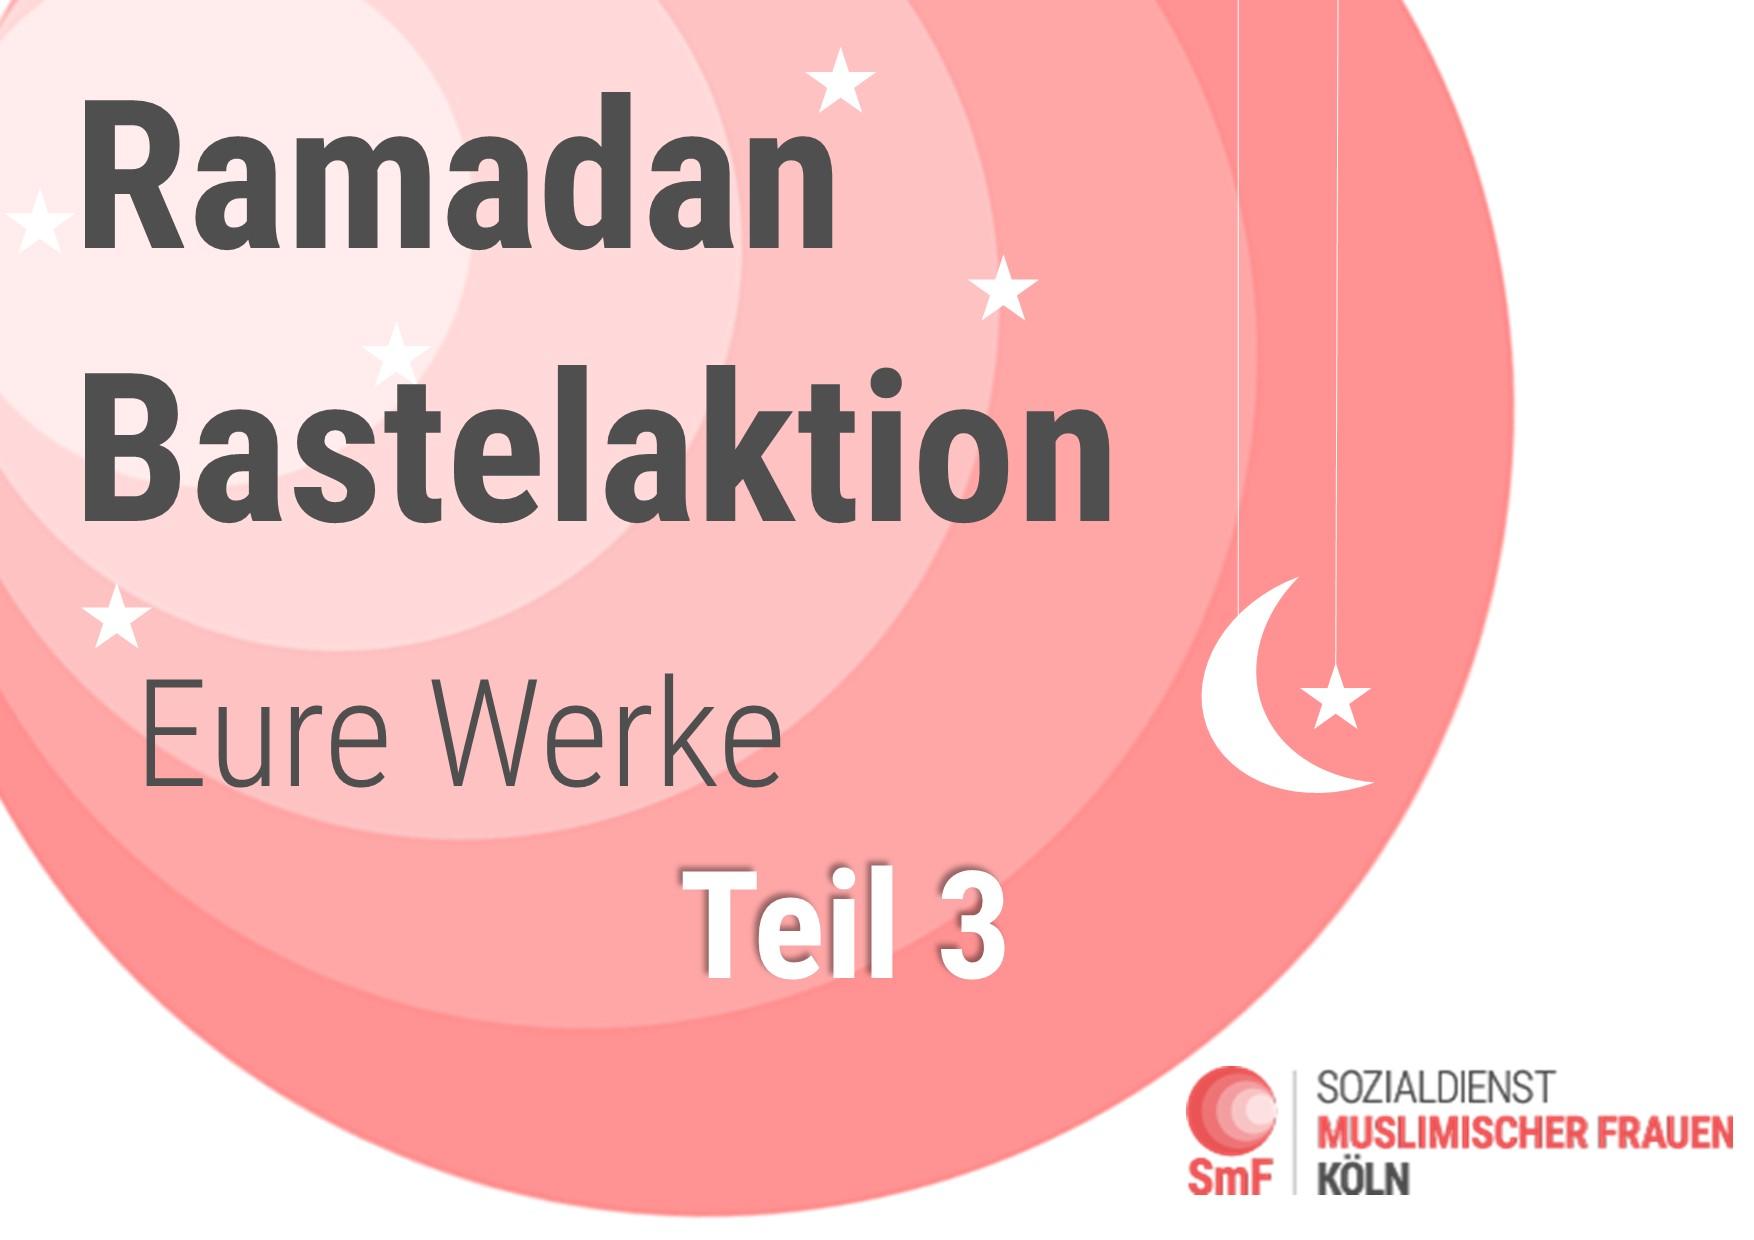 Ramadan 2020 Bastelaktion Eure Werke Teil 3